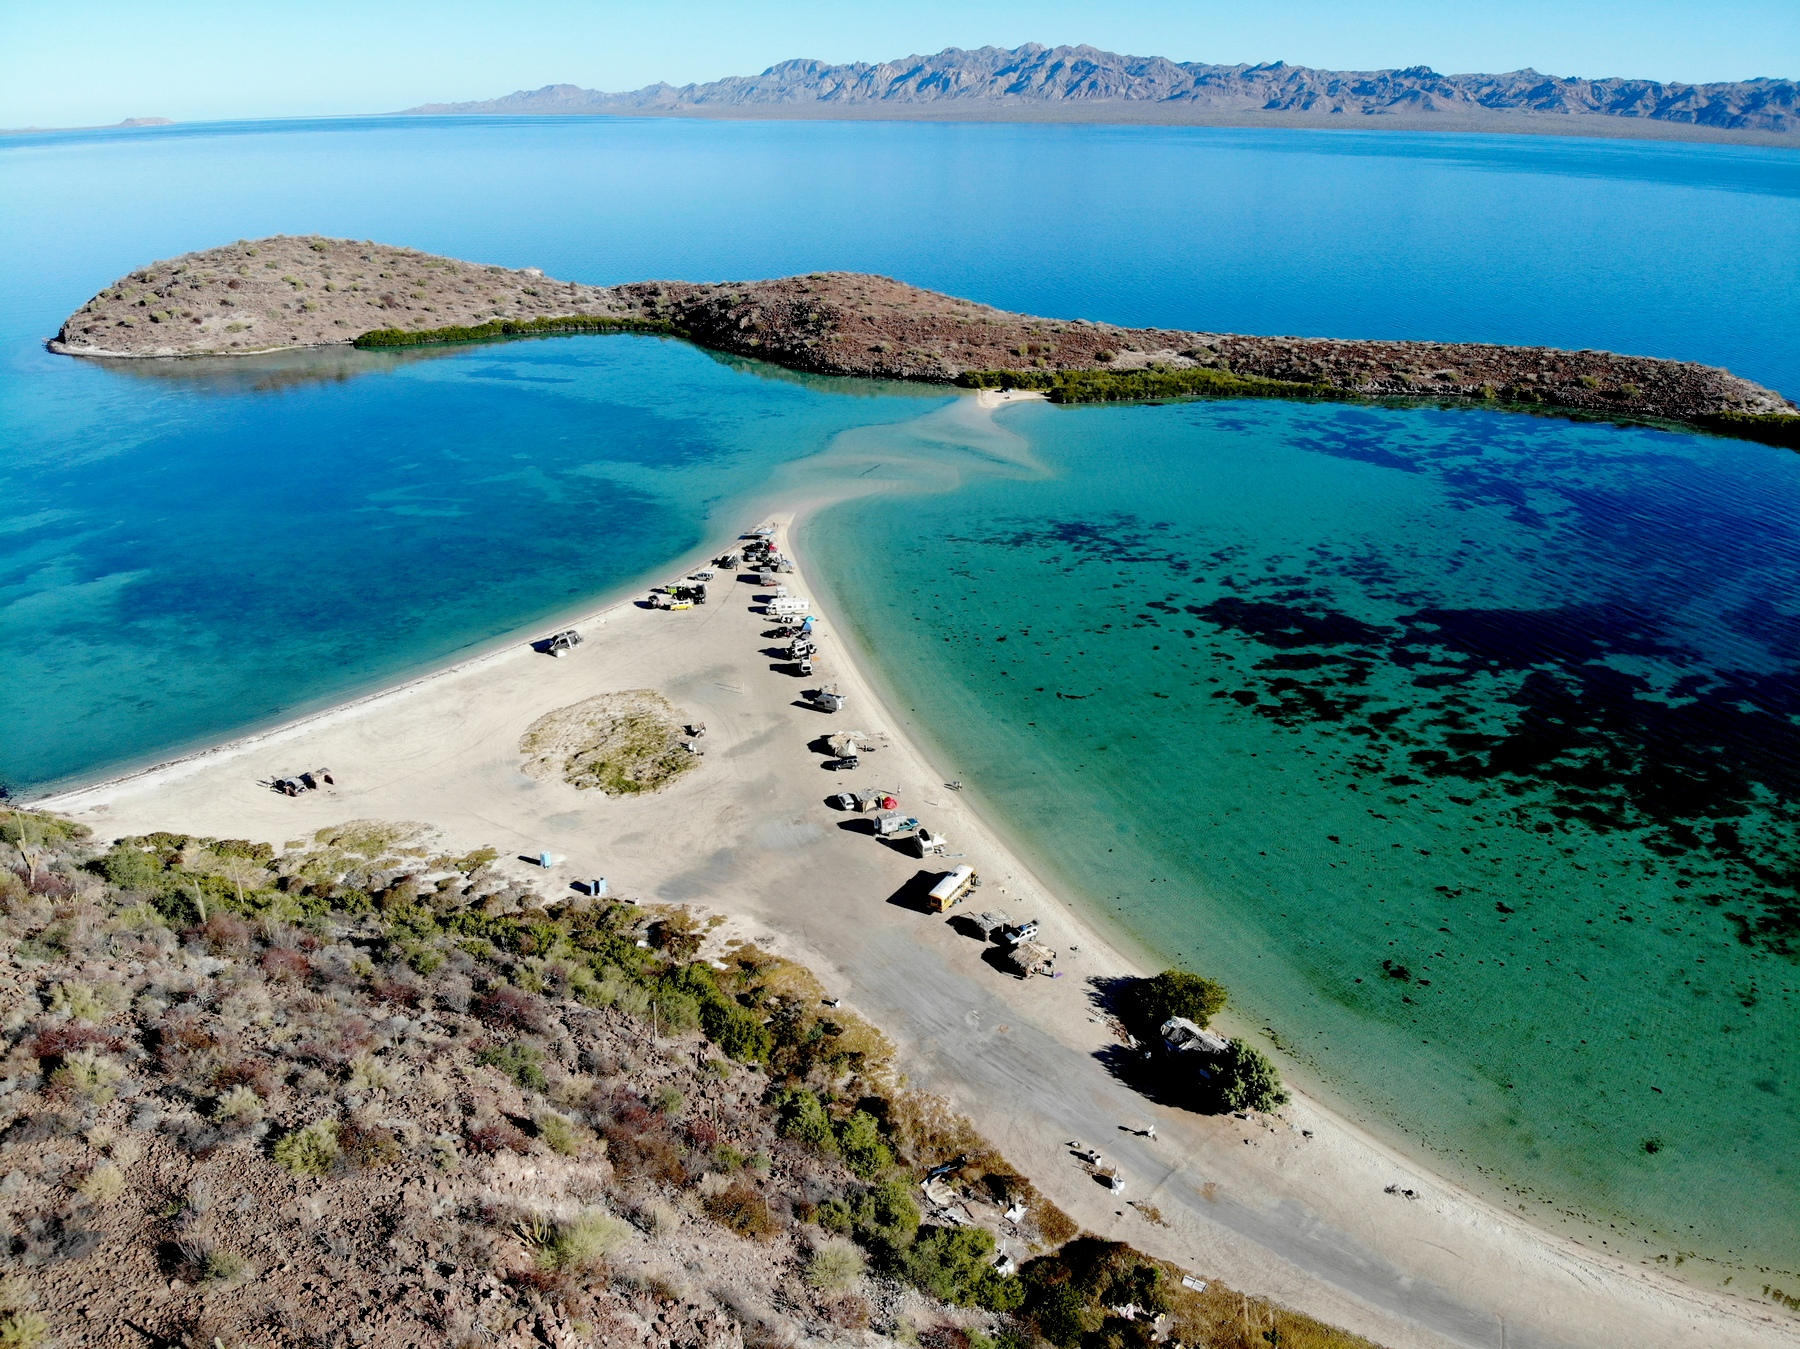 Playa de Requeson